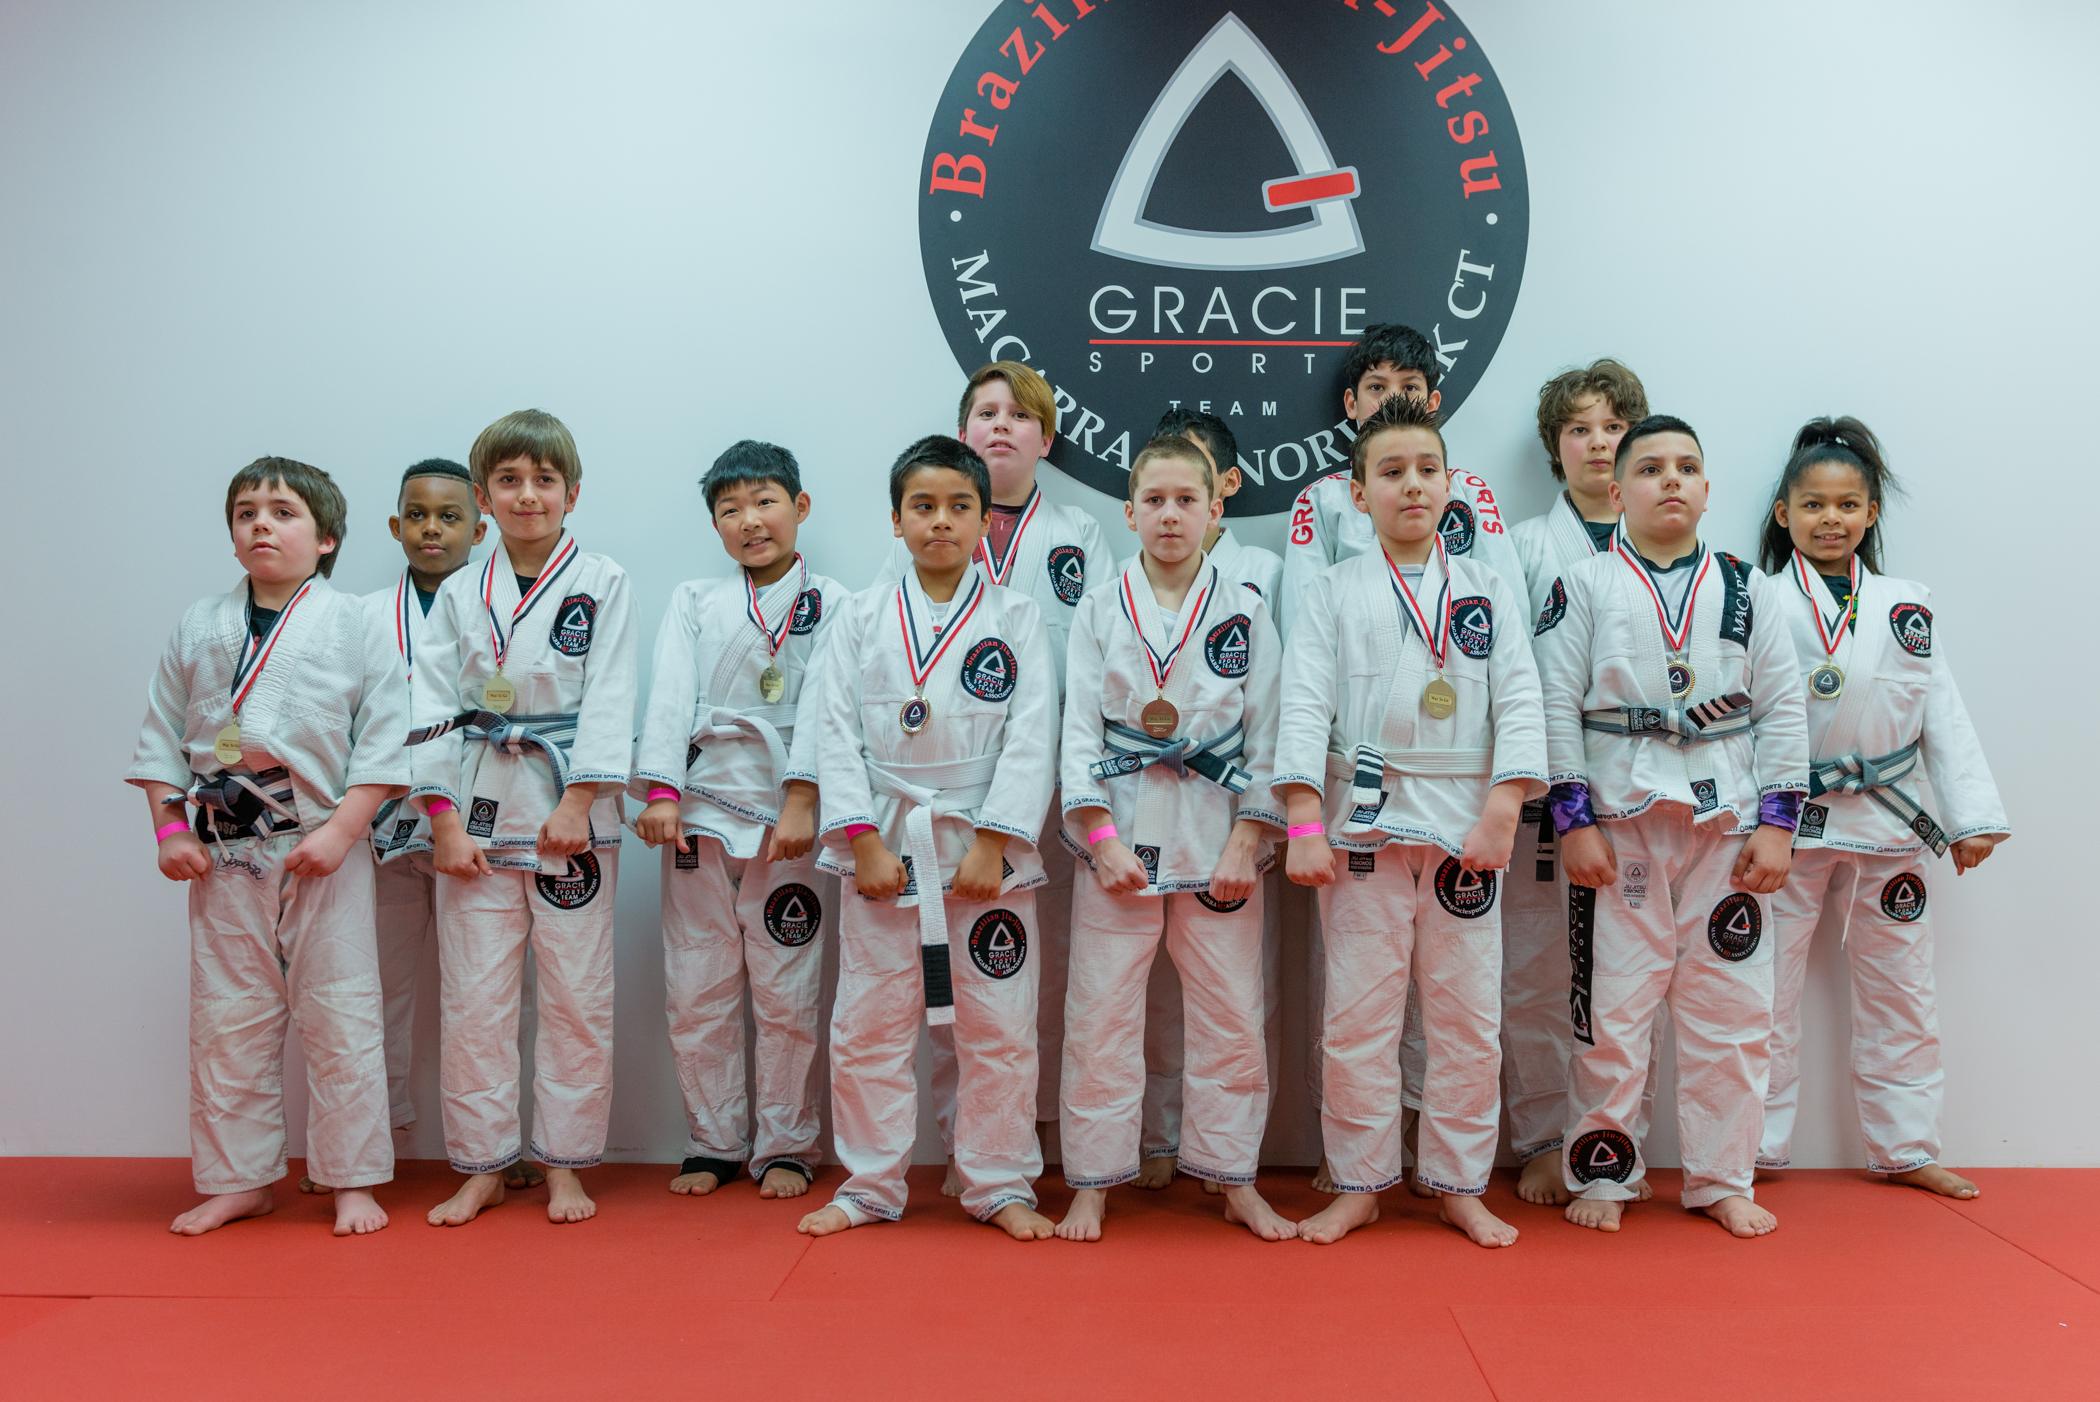 Gracie-Sports-Kids-103.jpg